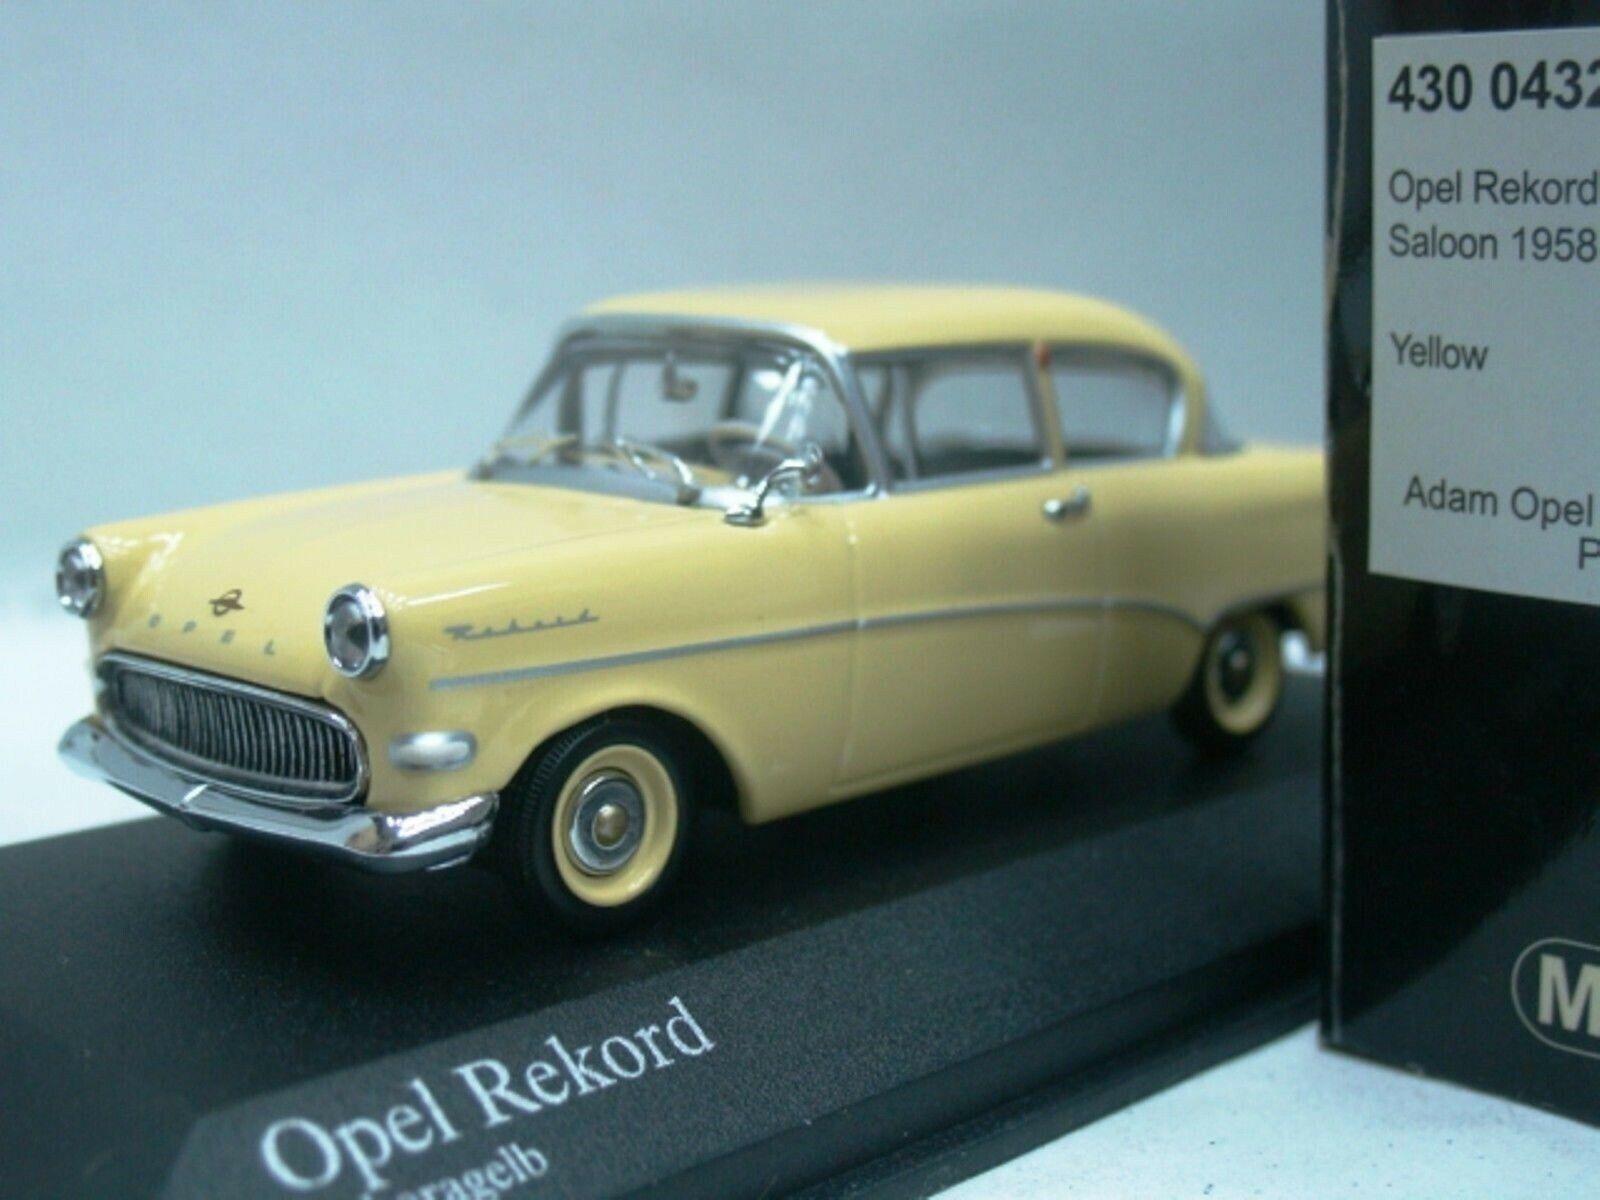 Wow extrêmeHommest rare OPEL REKORD P1 Berline  2d 1958 Jaune 1 43 Minichamps-diplomate  magasin discount